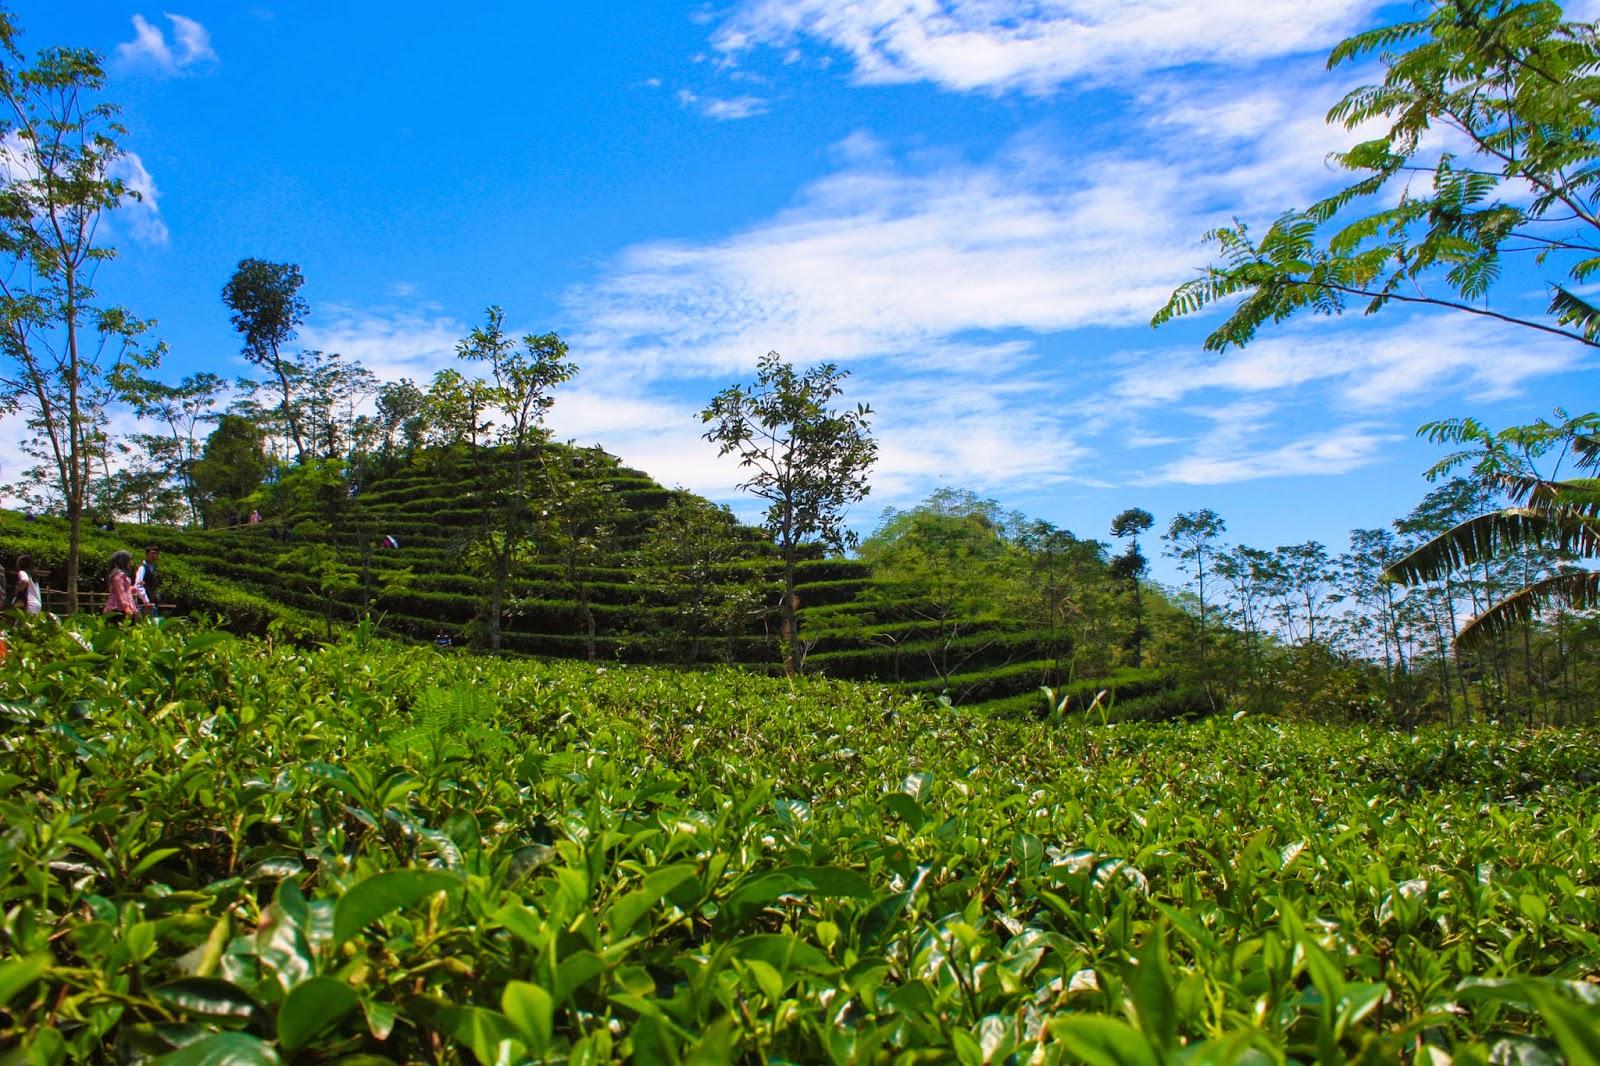 Teh Nglinggo Kebun Samigaluh Kota Yogyakarta